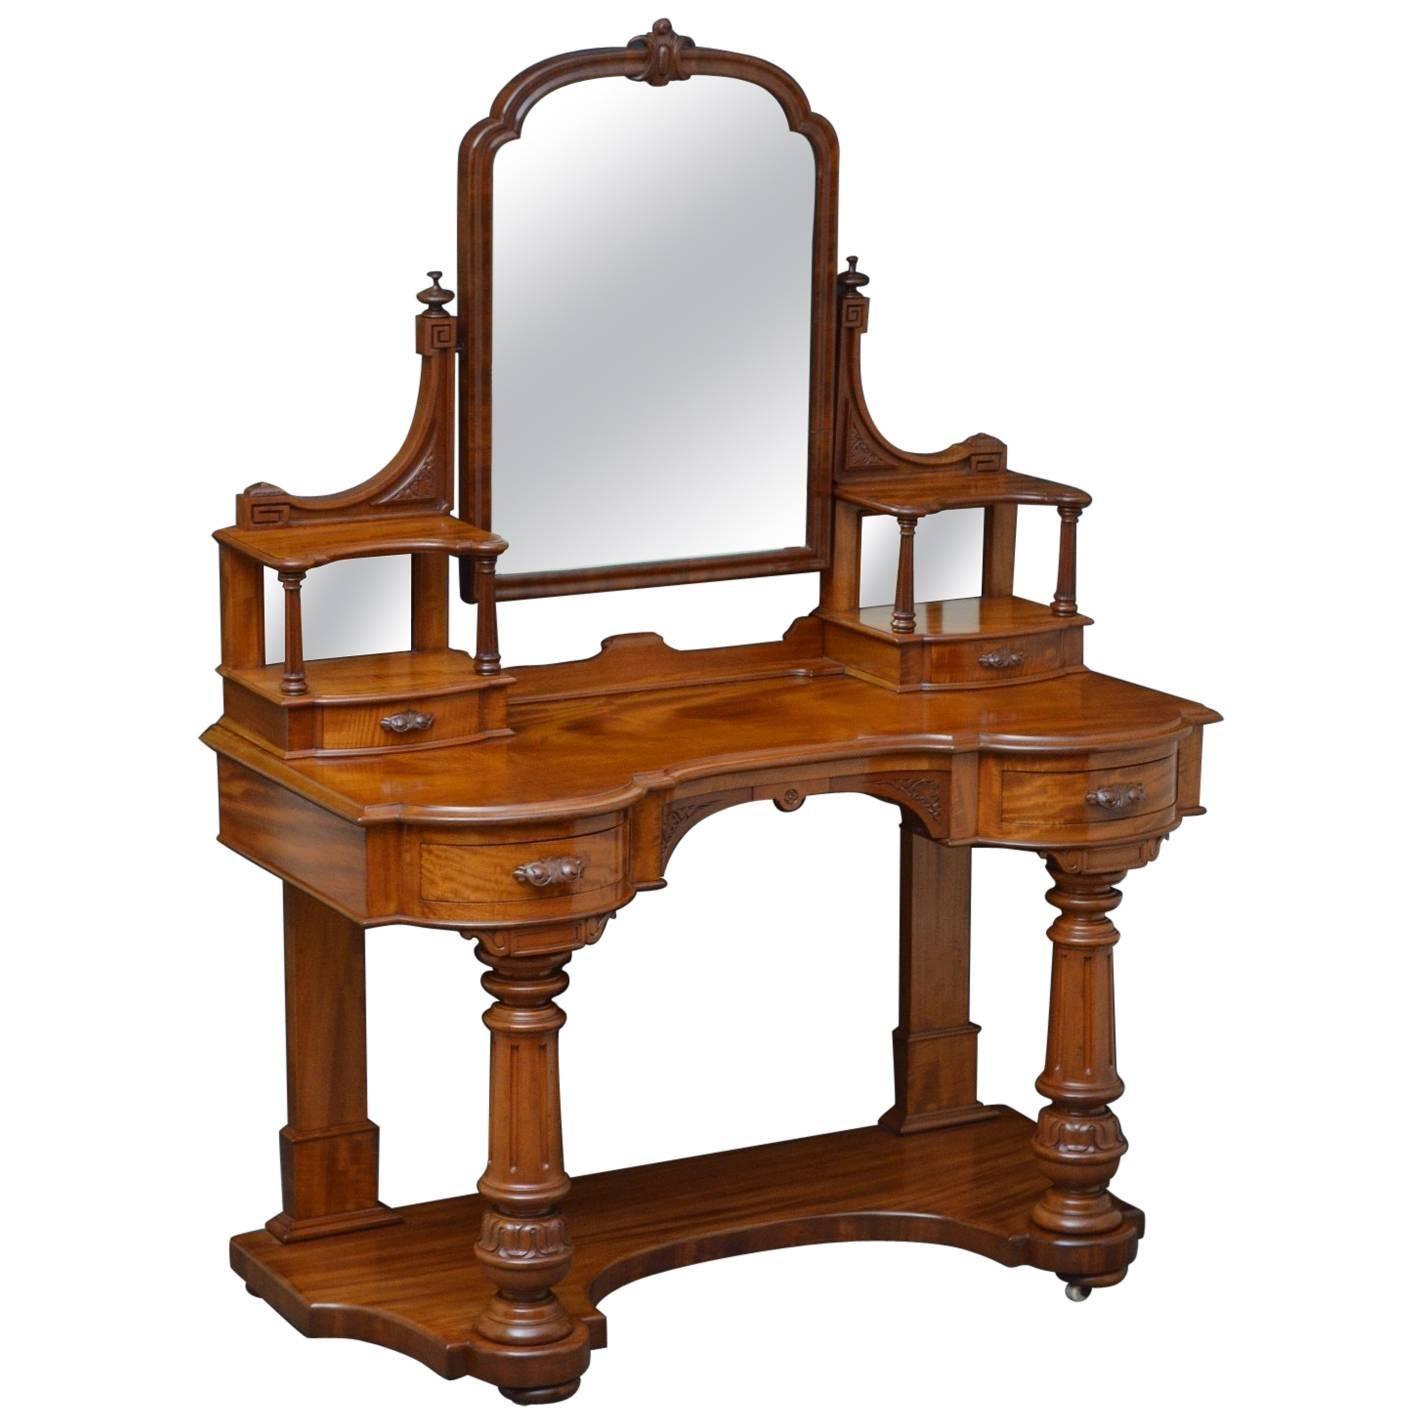 1870s bedroom furniture 21 for sale at 1stdibs rh 1stdibs com 1970s bedroom photos 1970s bedroom units